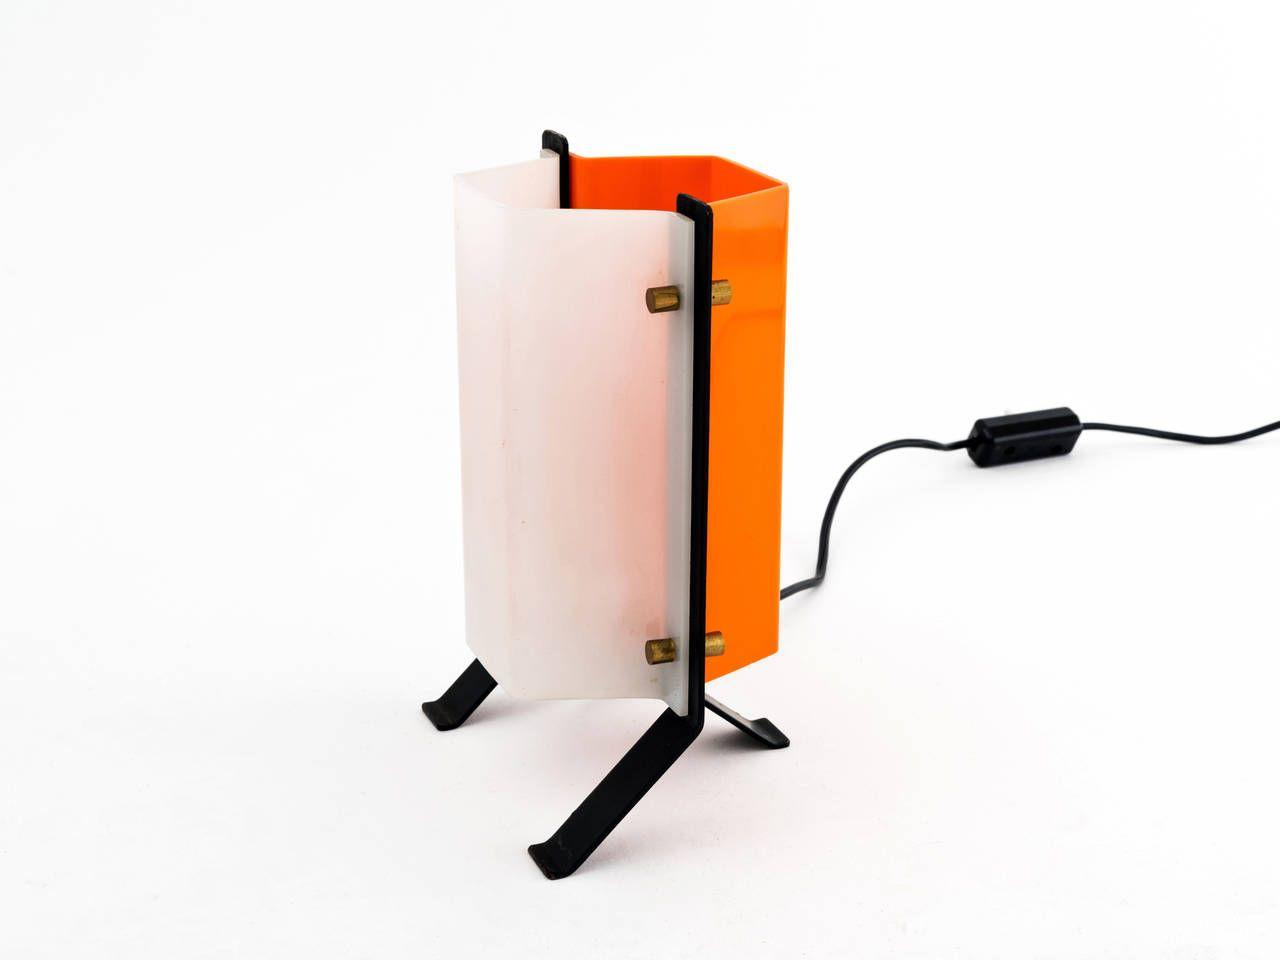 1960s Italian Modern Desk Lamp Attributed to Stilux 4